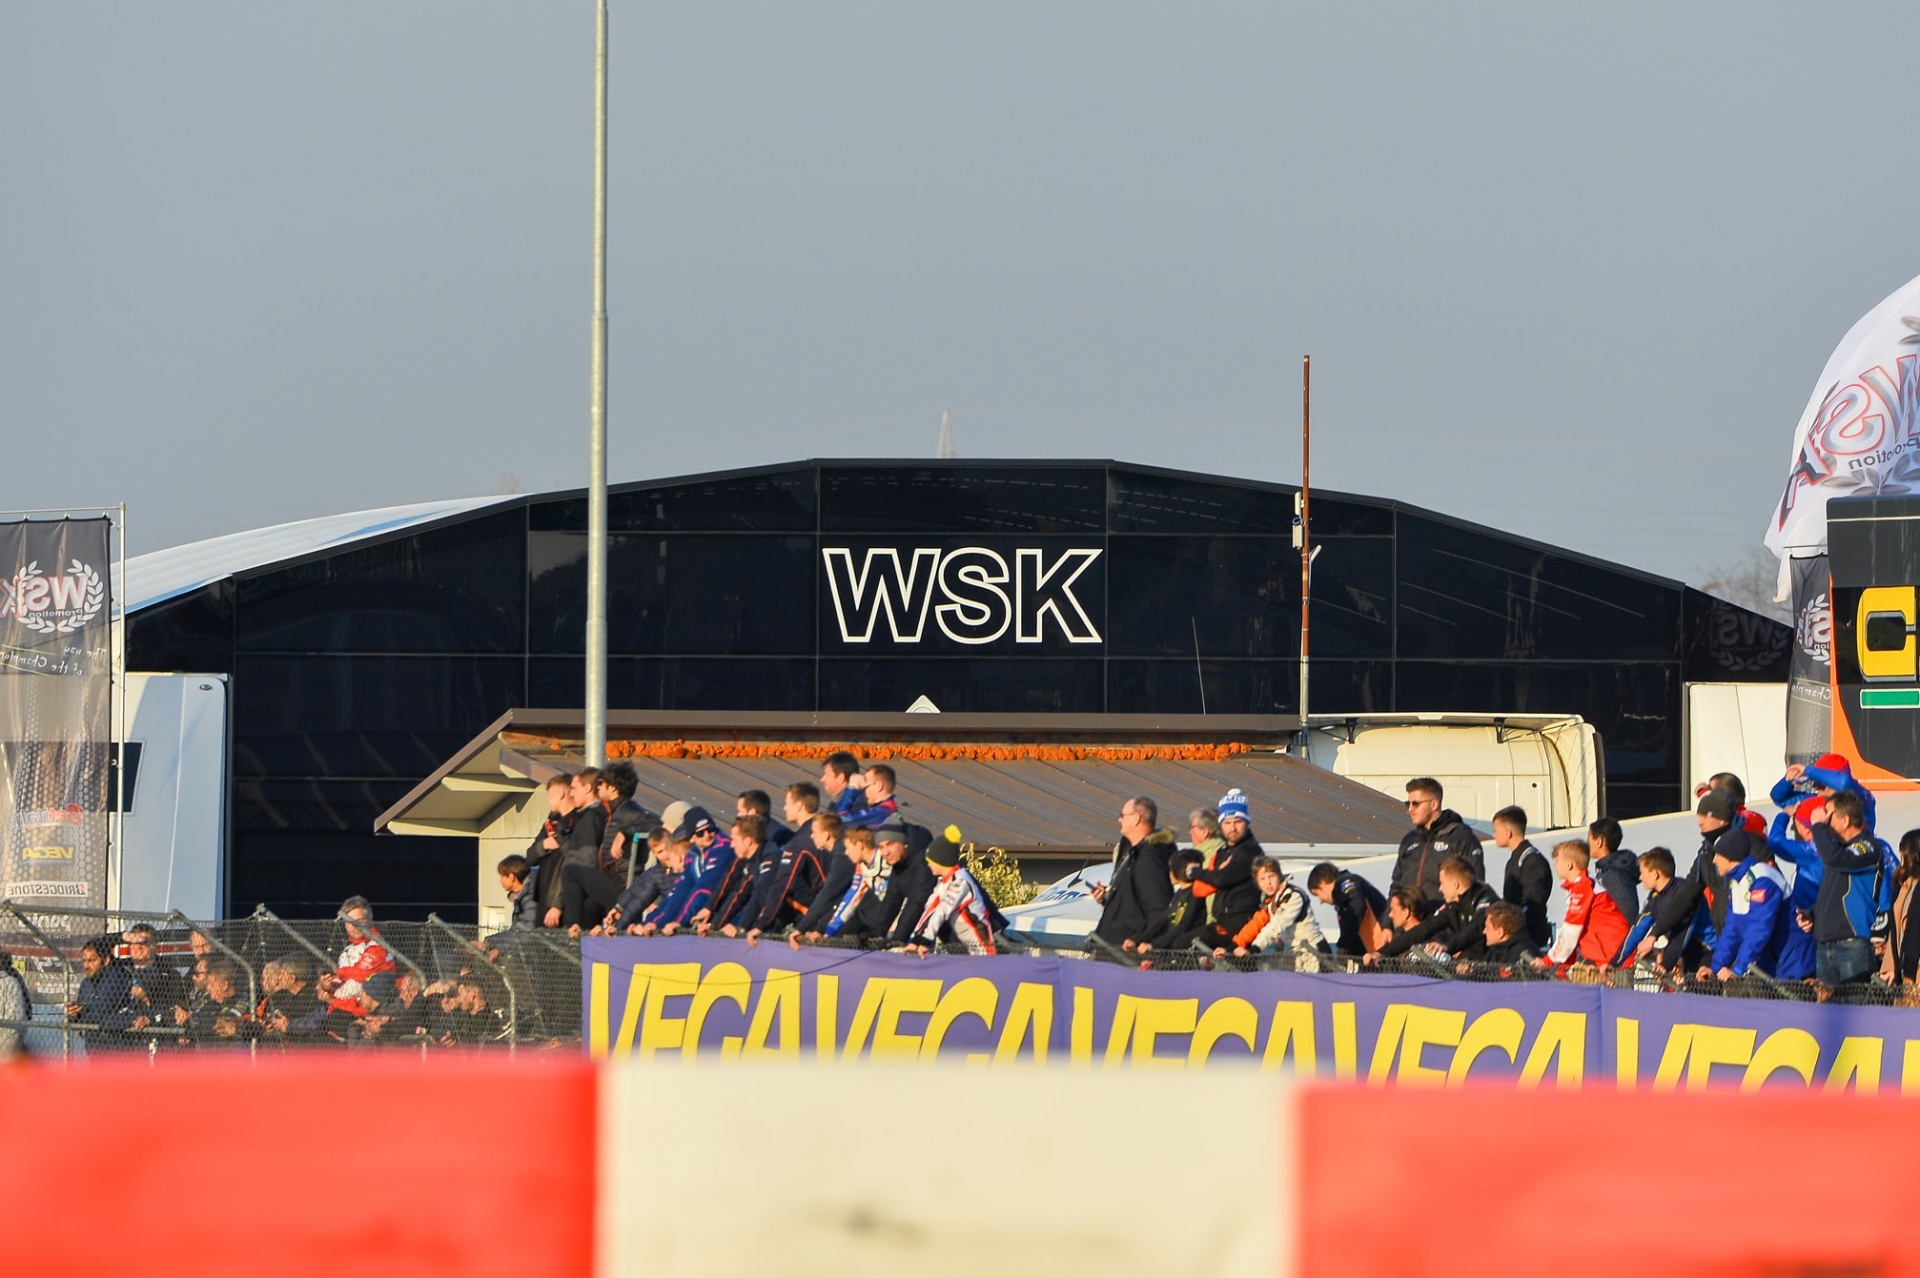 The WSK season starts again in July